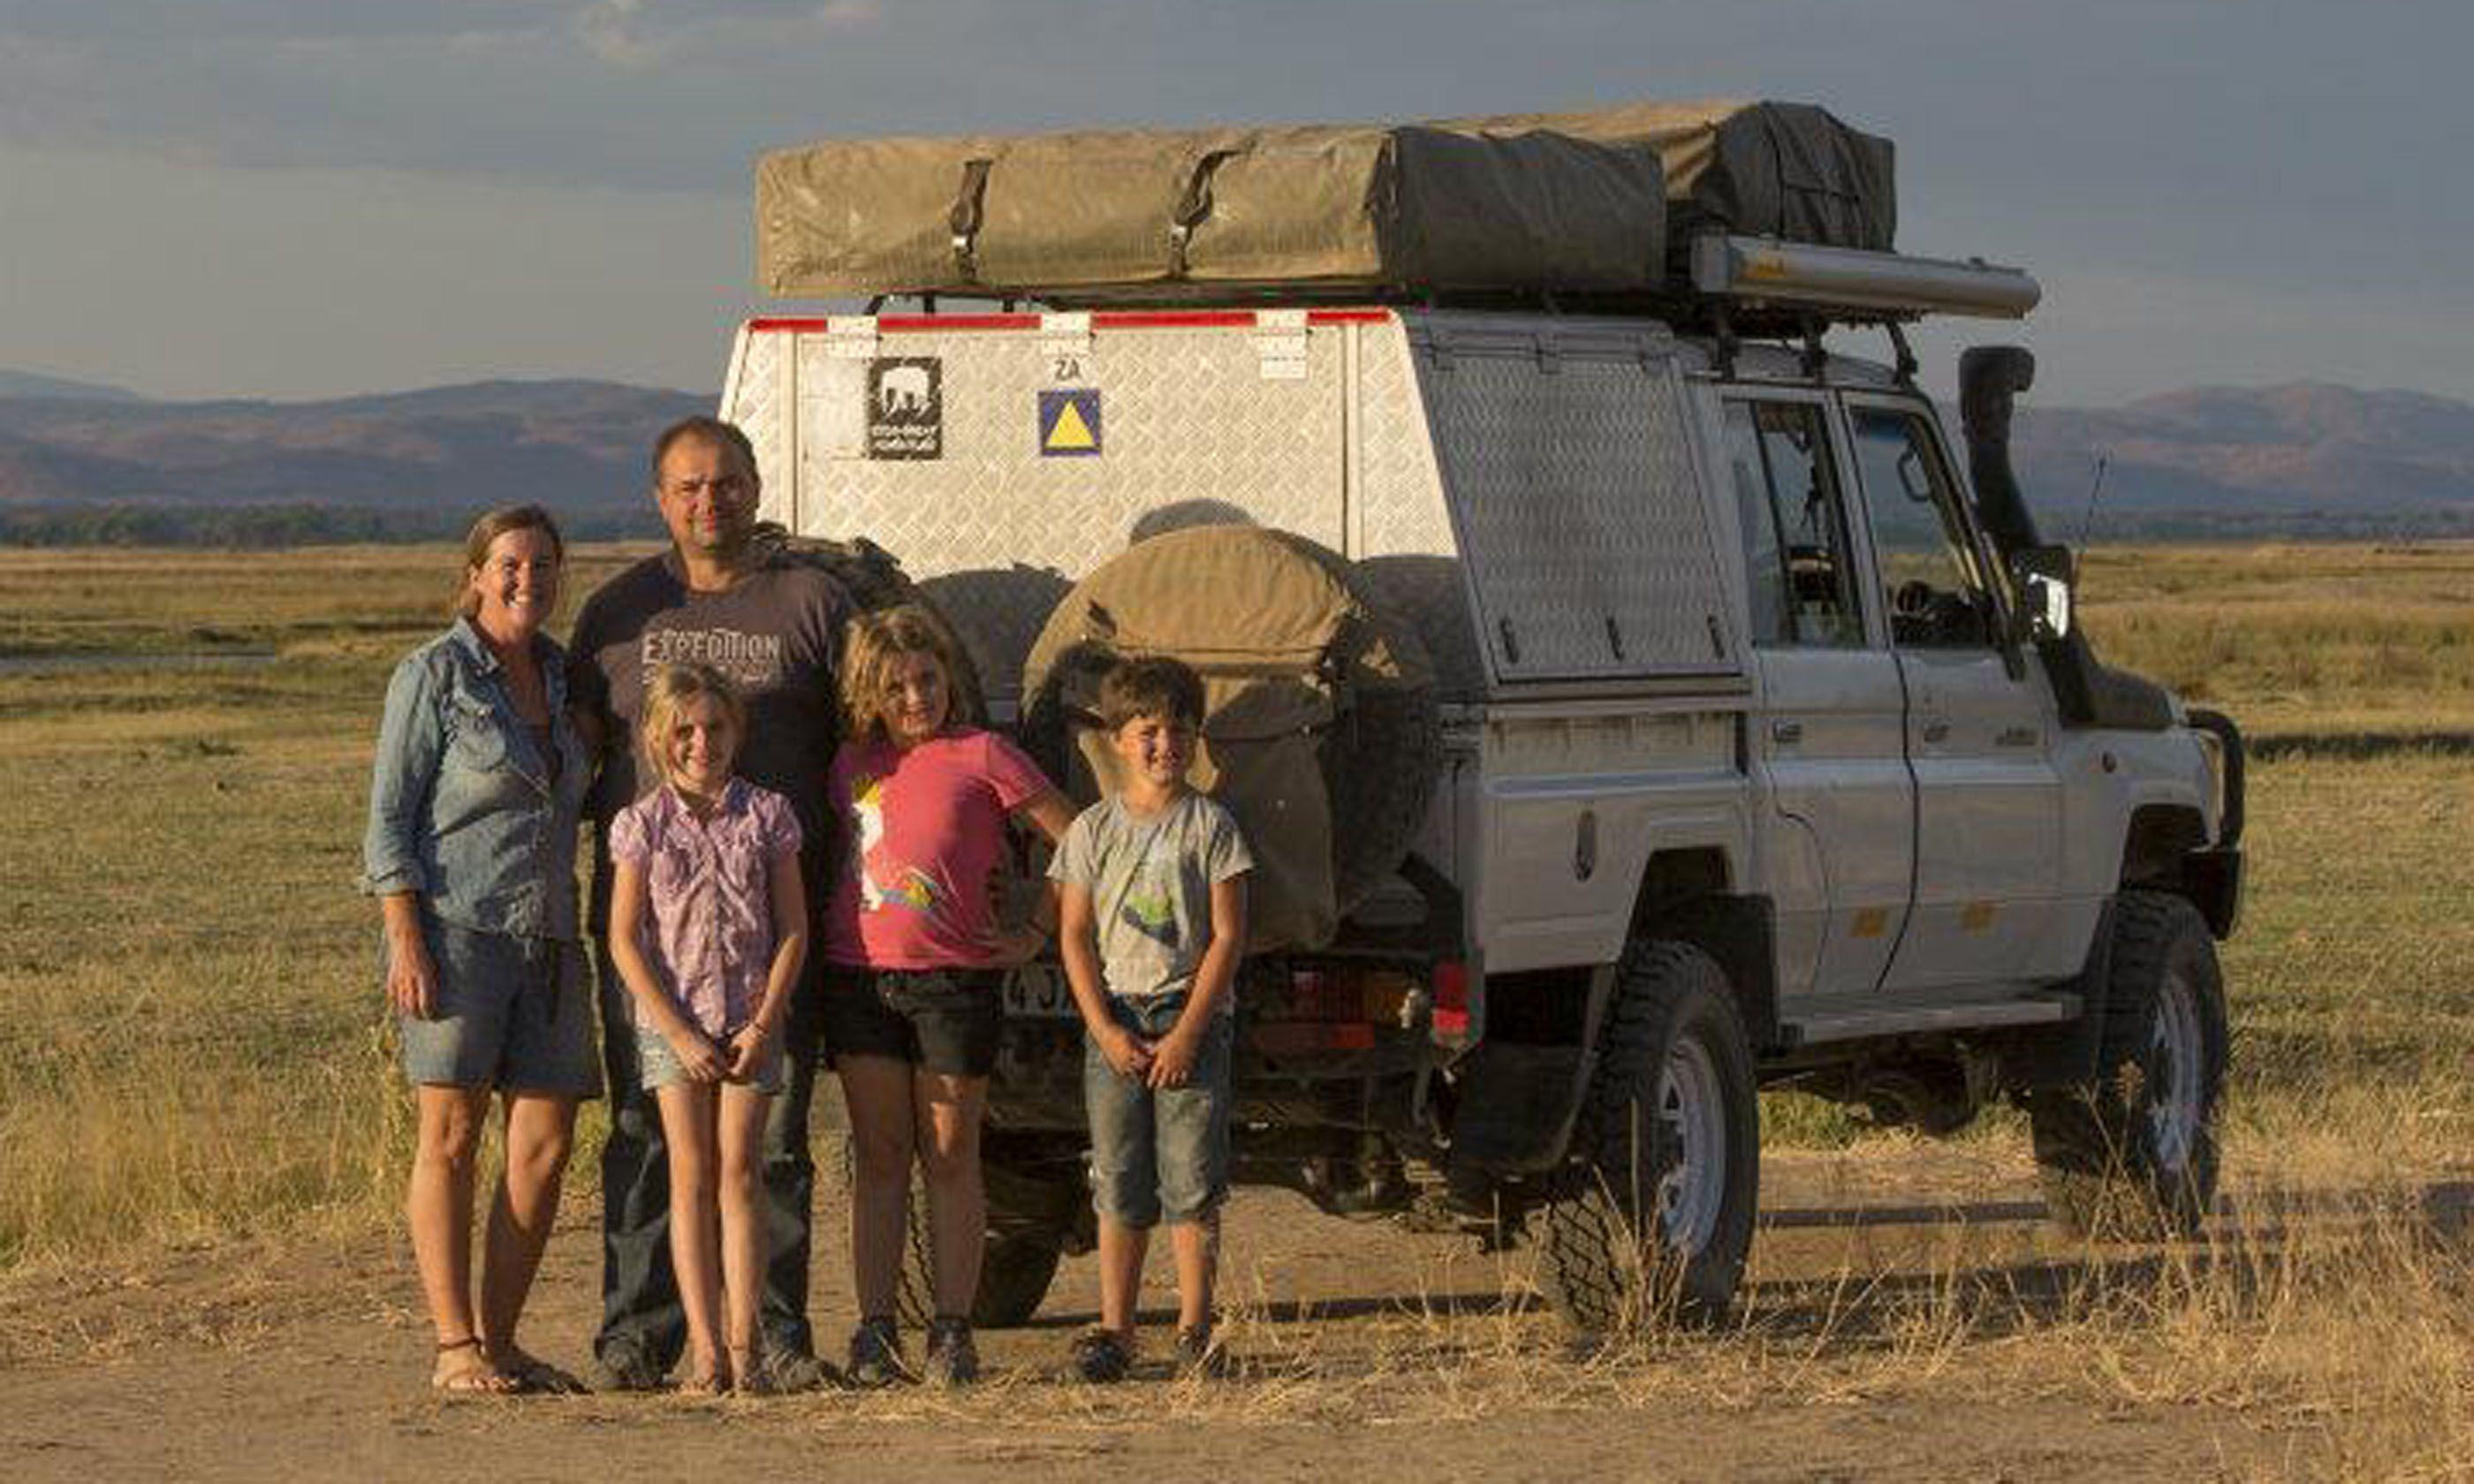 Cagol family on safari (Edwina Cagol)